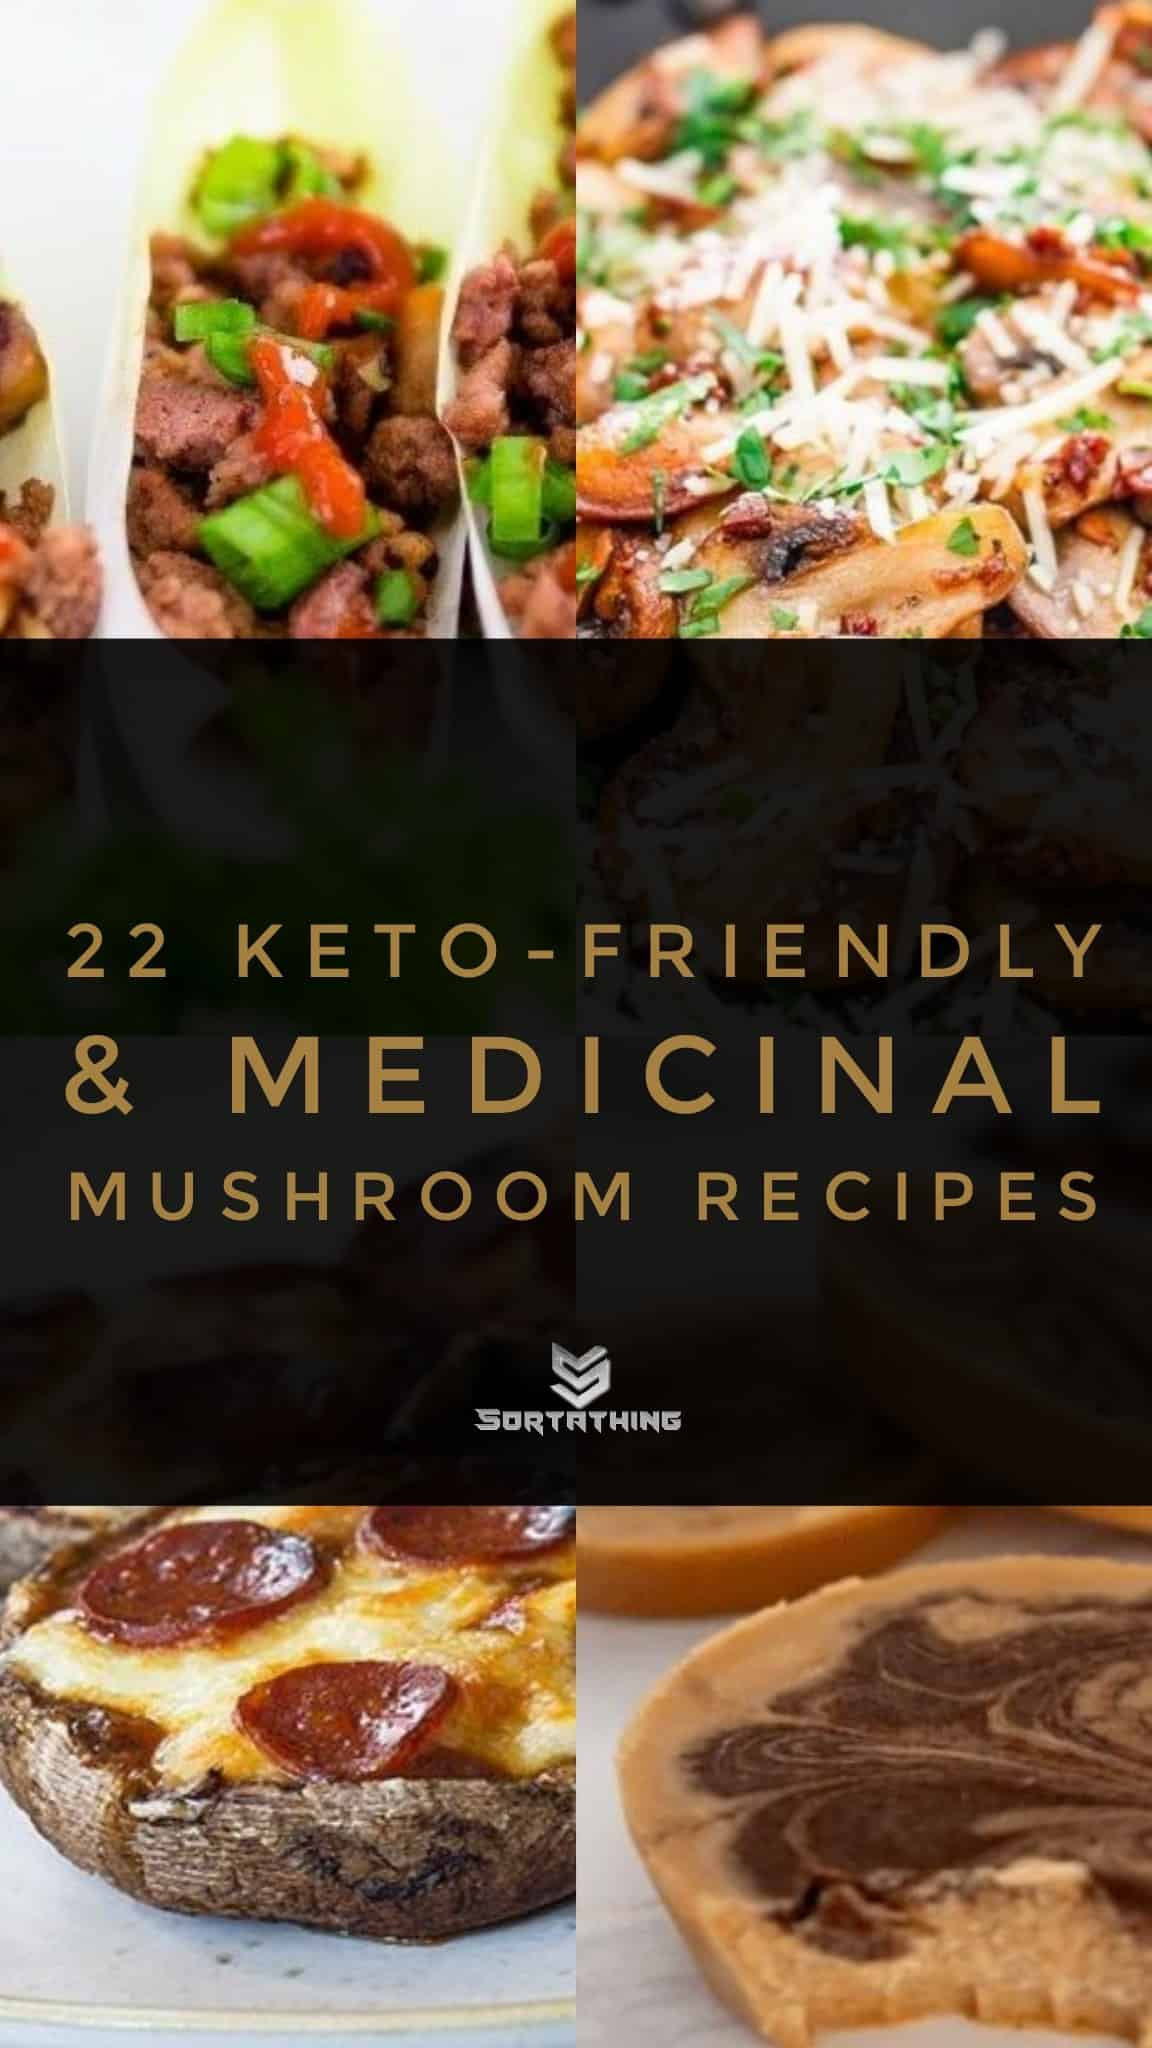 22 Keto Mushroom Recipes